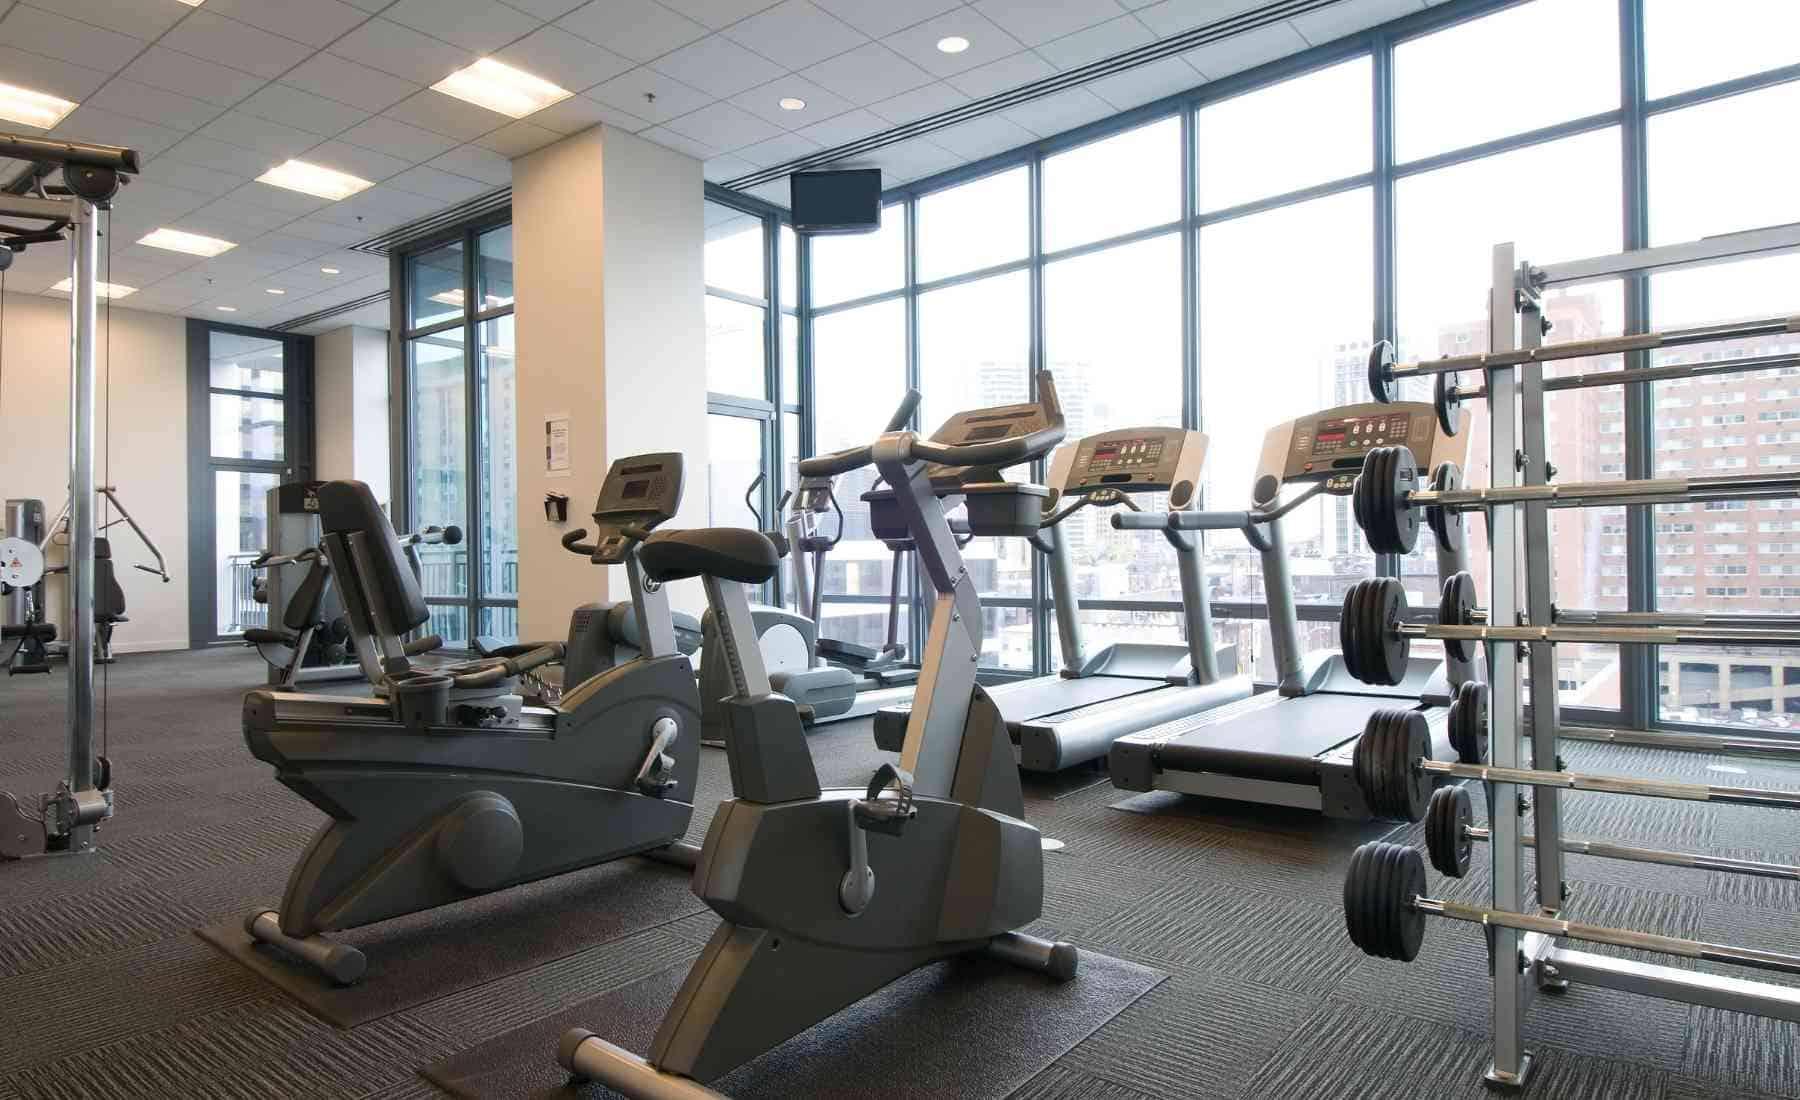 Rental Business Ideas - Gym Equipment